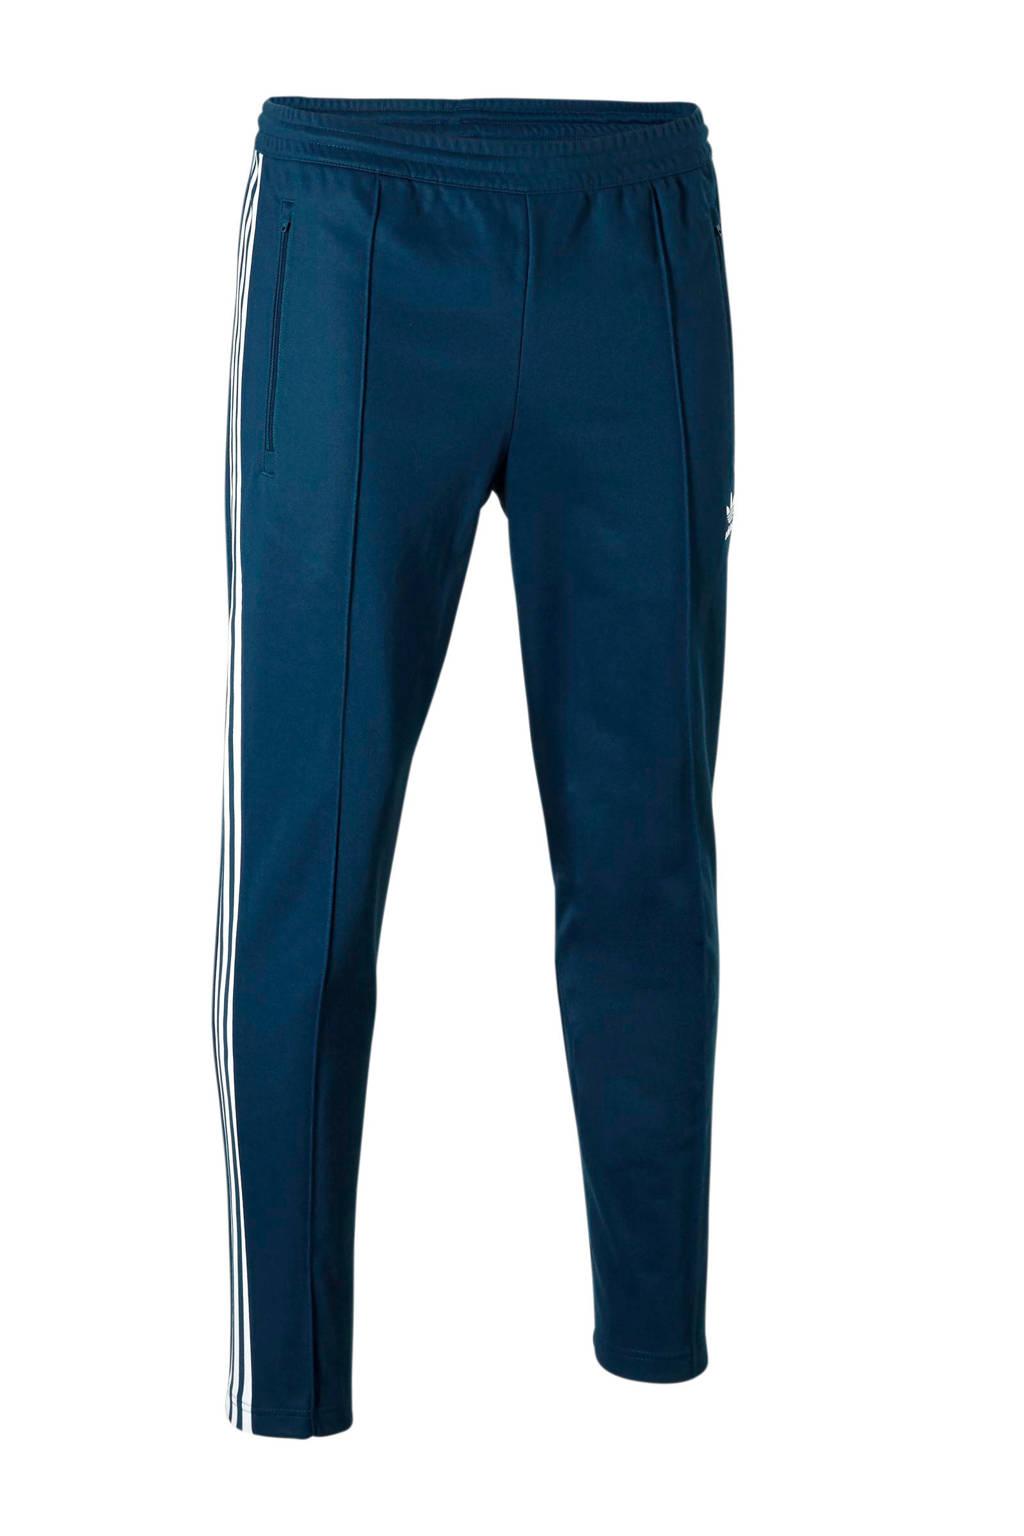 adidas Originals Adicolor joggingbroek donkerblauw, Donkerblauw